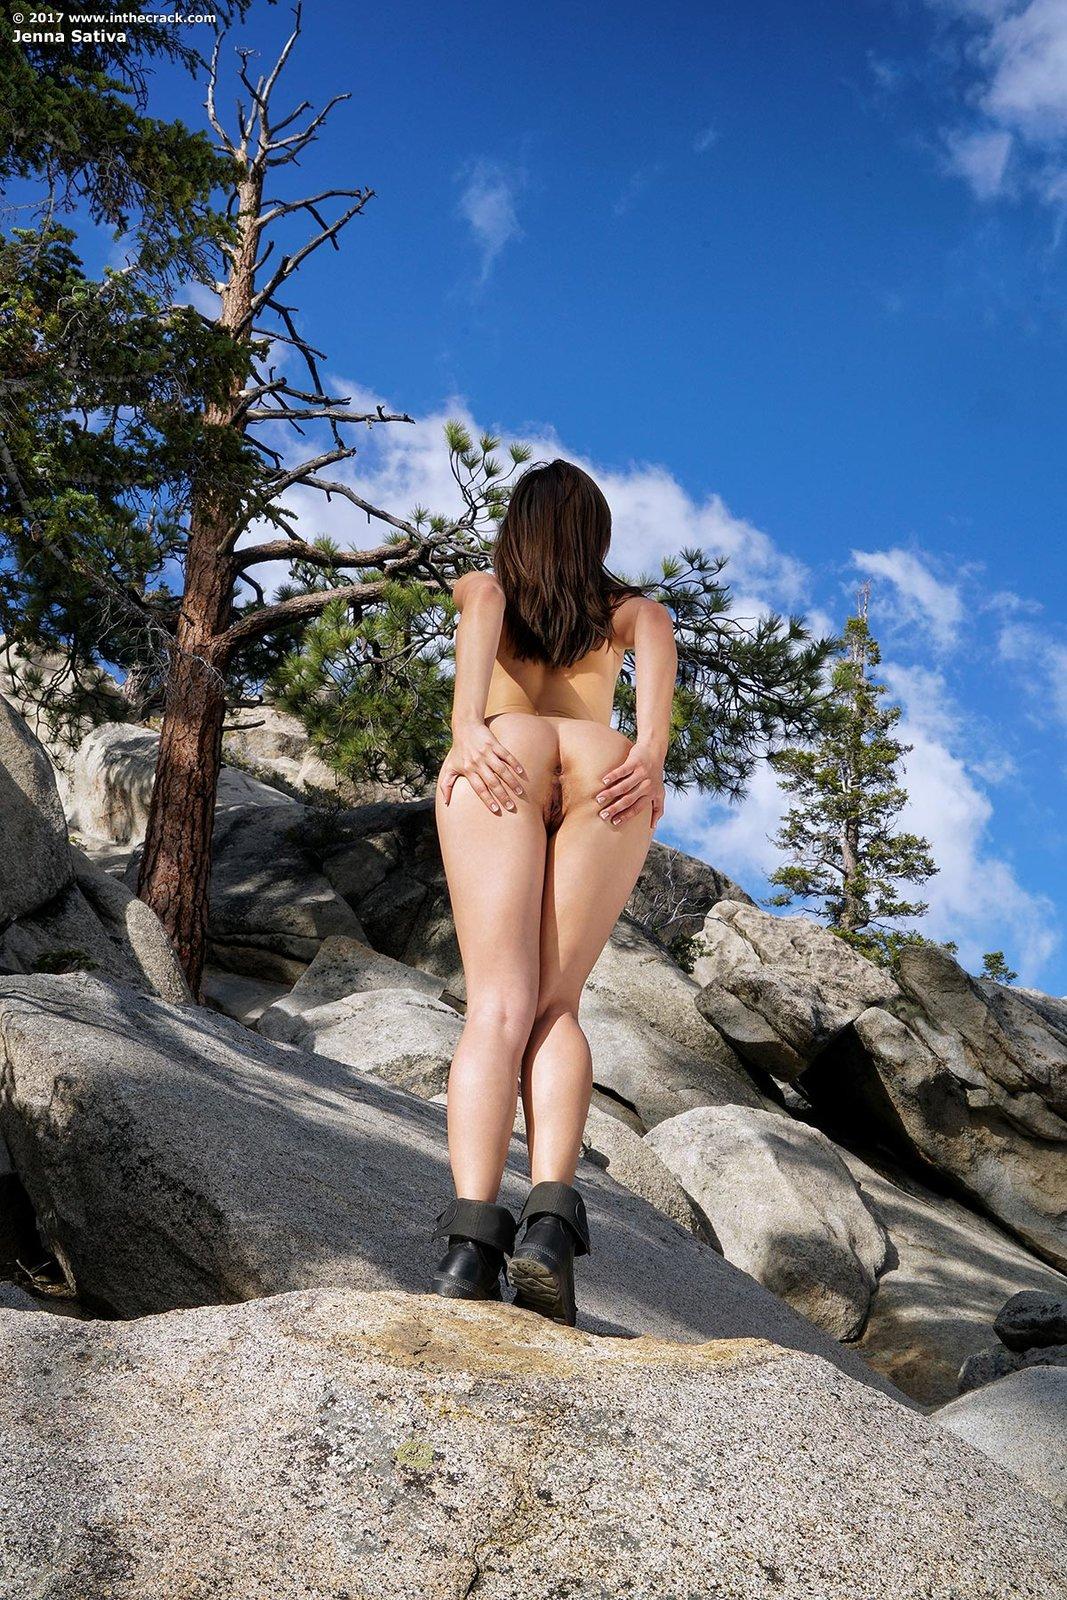 Zdjęcie porno - 1112 - Suczka na skale